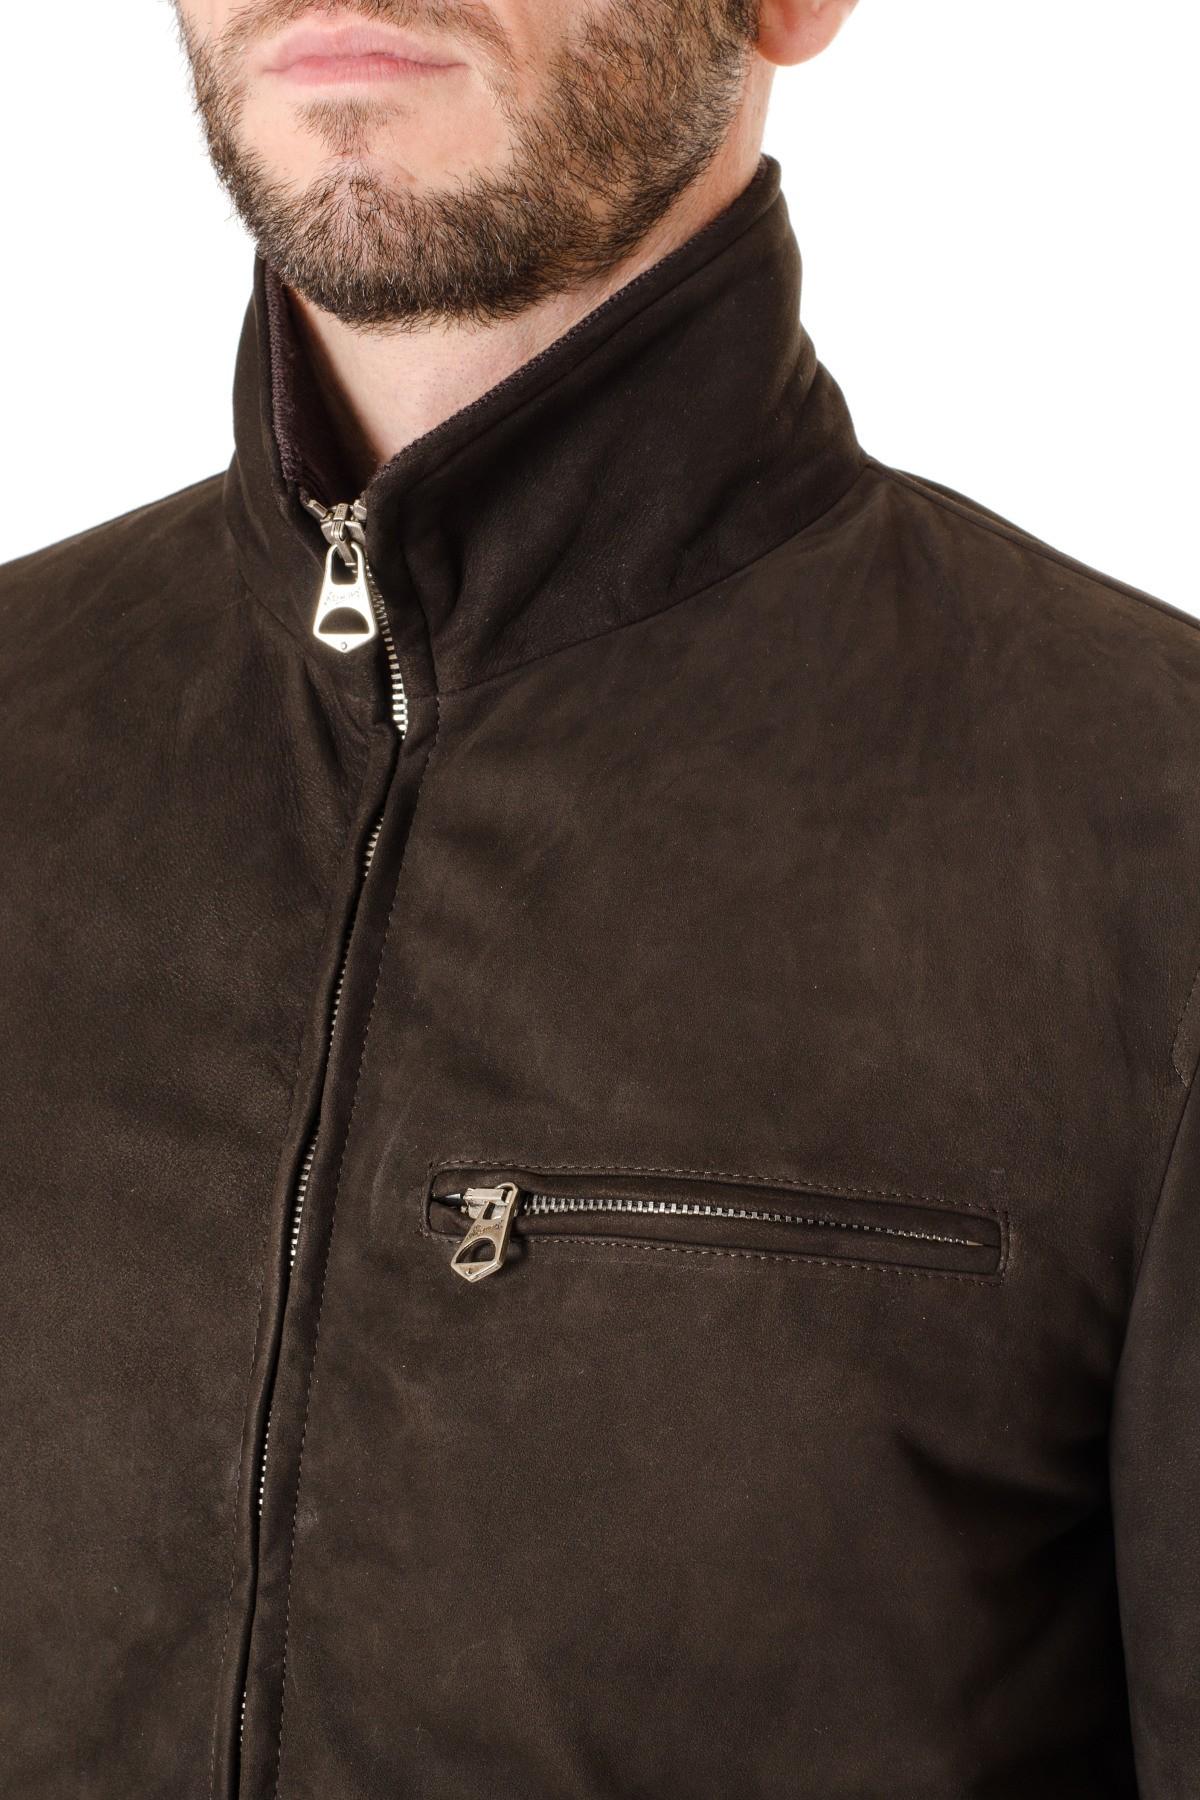 Leather jacket brown or black